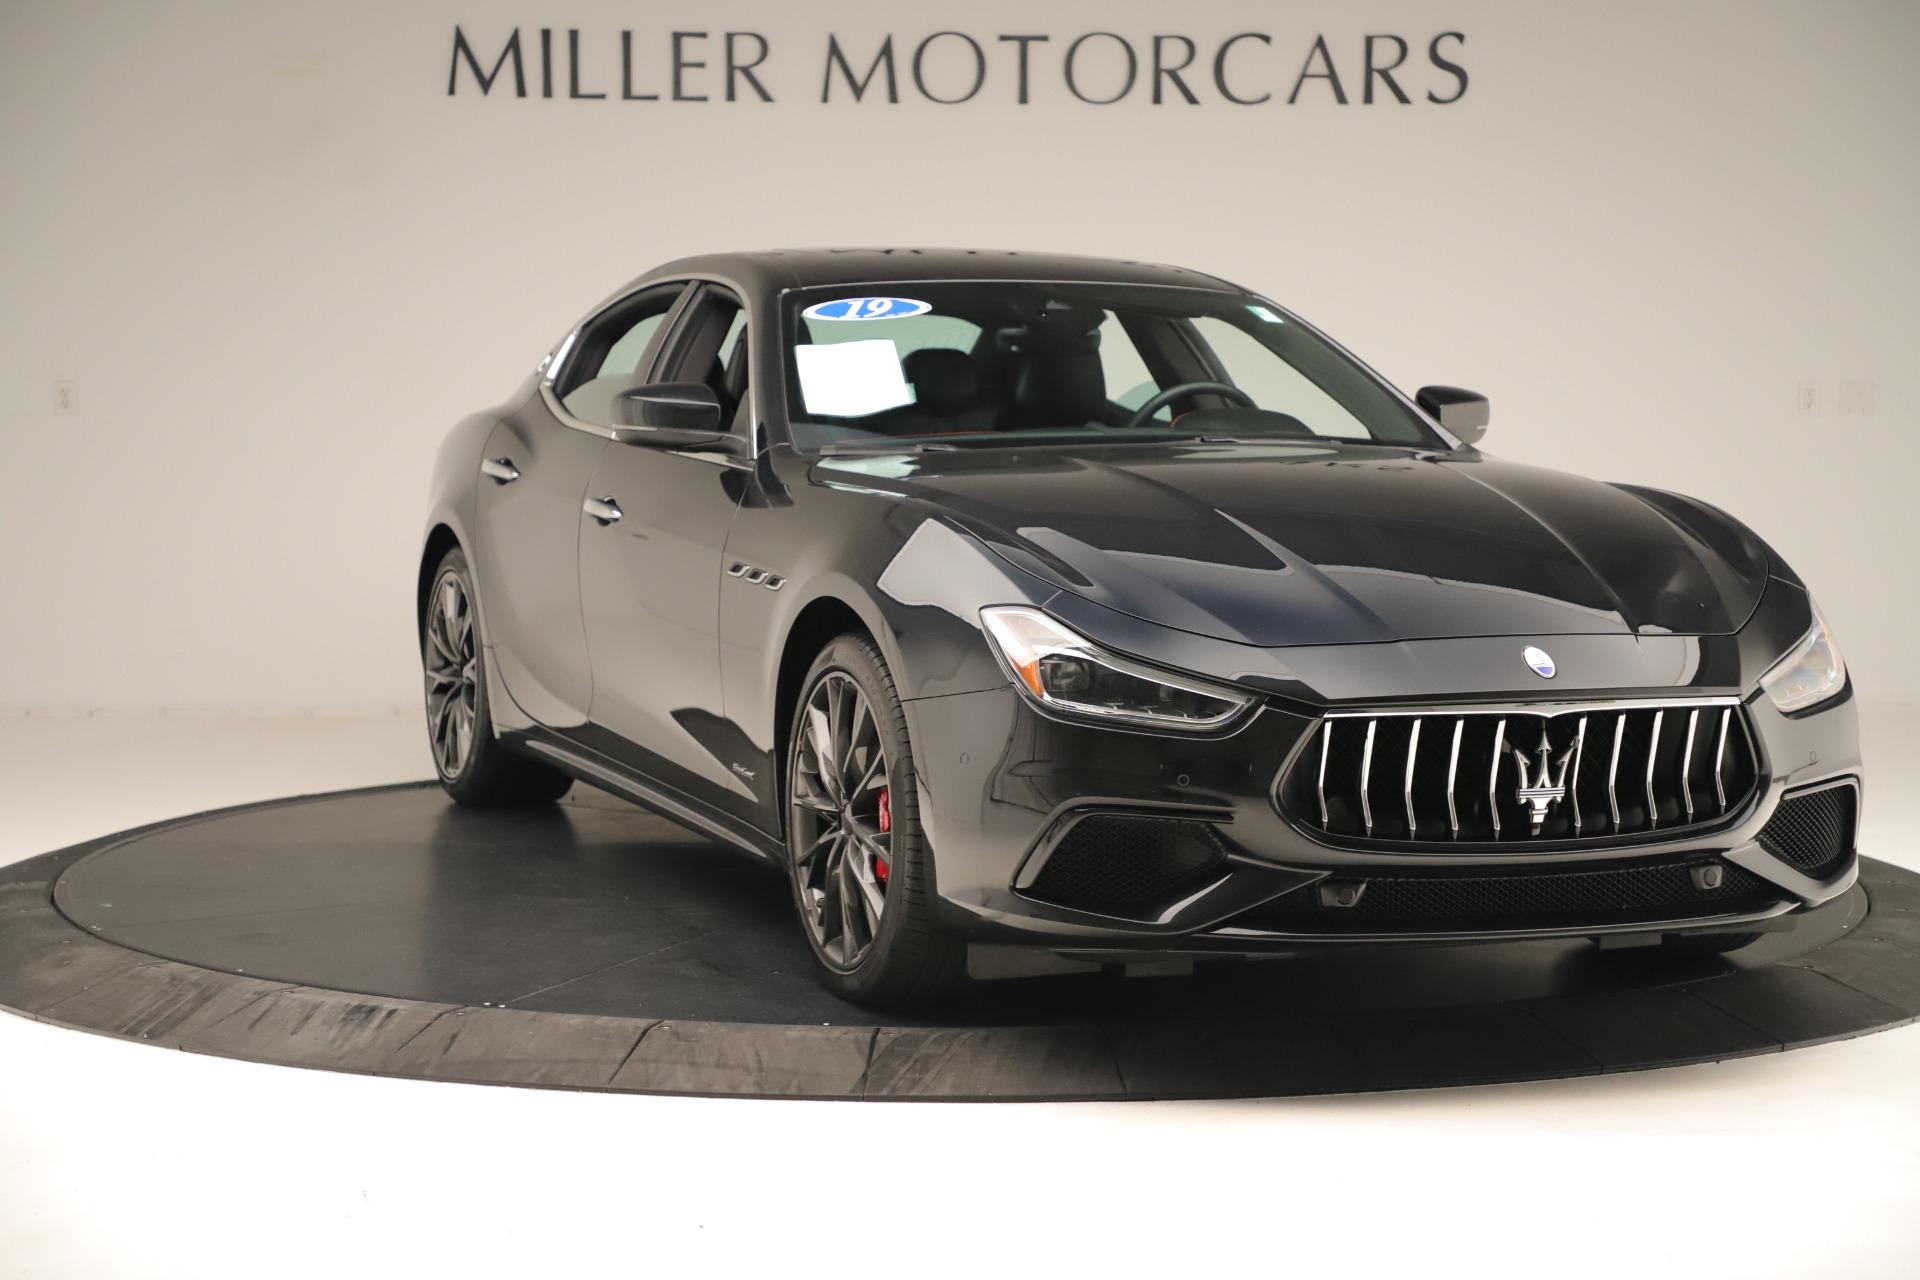 New 2019 Maserati Ghibli S Q4 GranSport For Sale In Westport, CT 2640_p11